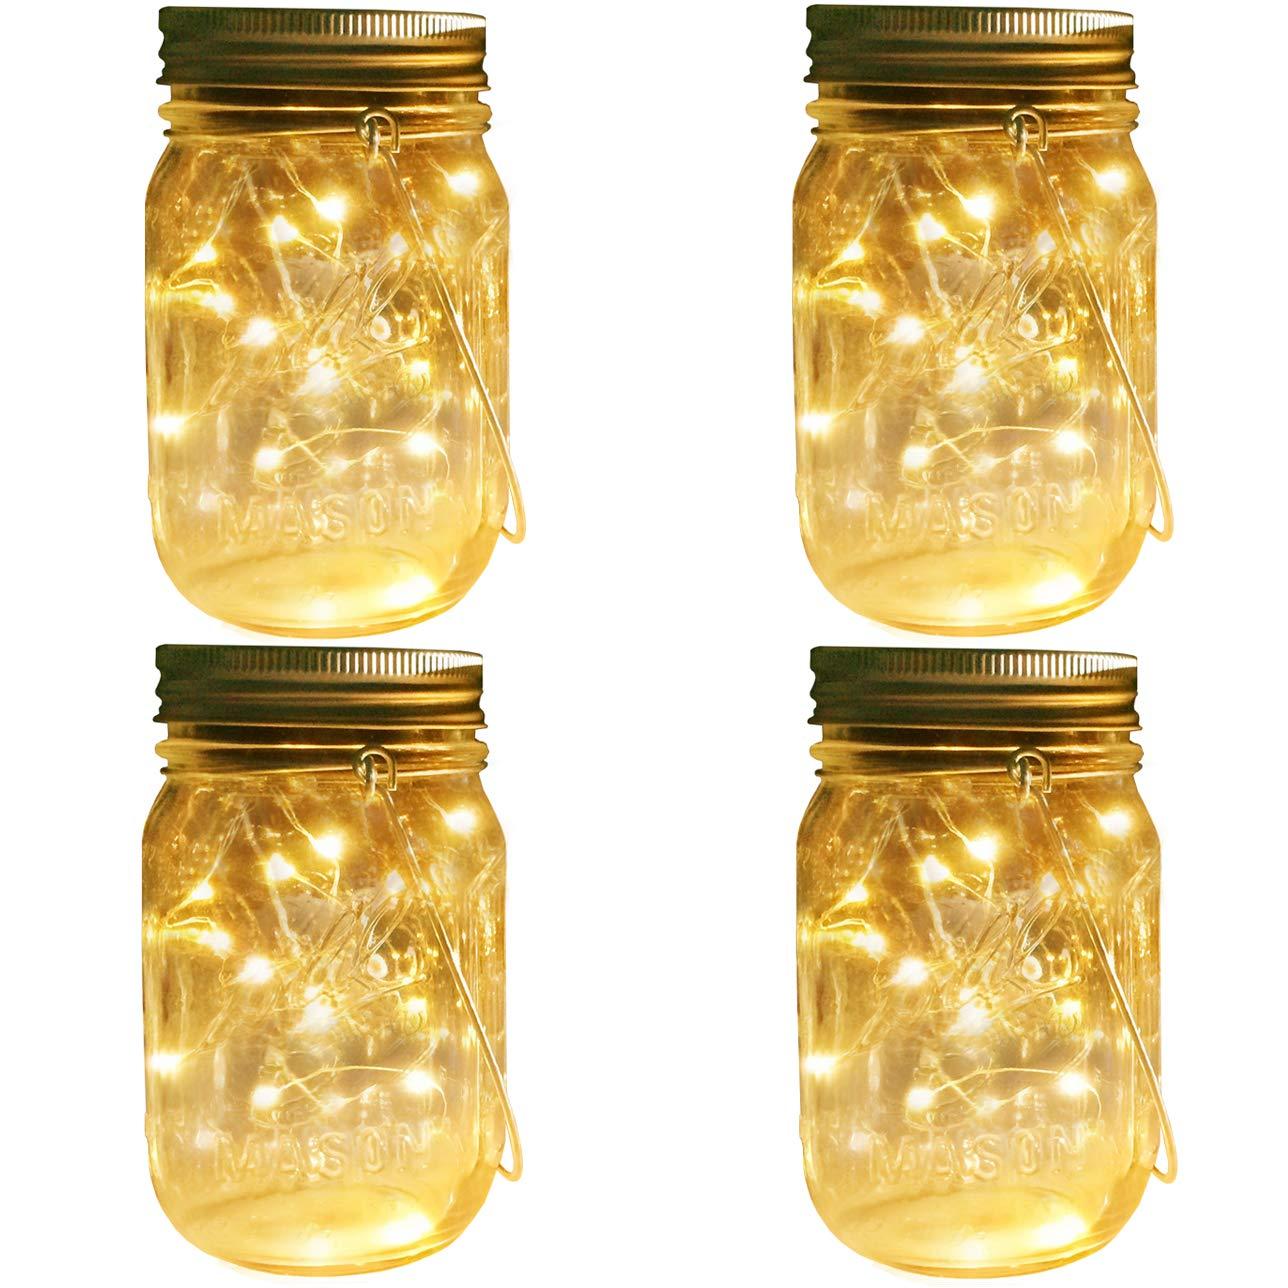 Mason Jar Solar Lights Lanterns, 4 Pack 30 LEDs Fairy Firefly Led String Lights with Glass Mason Jar,Best for Wedding Garden Patio Outdoor Solar Powered Hanging Lanterns(Jars & Hangers Included)